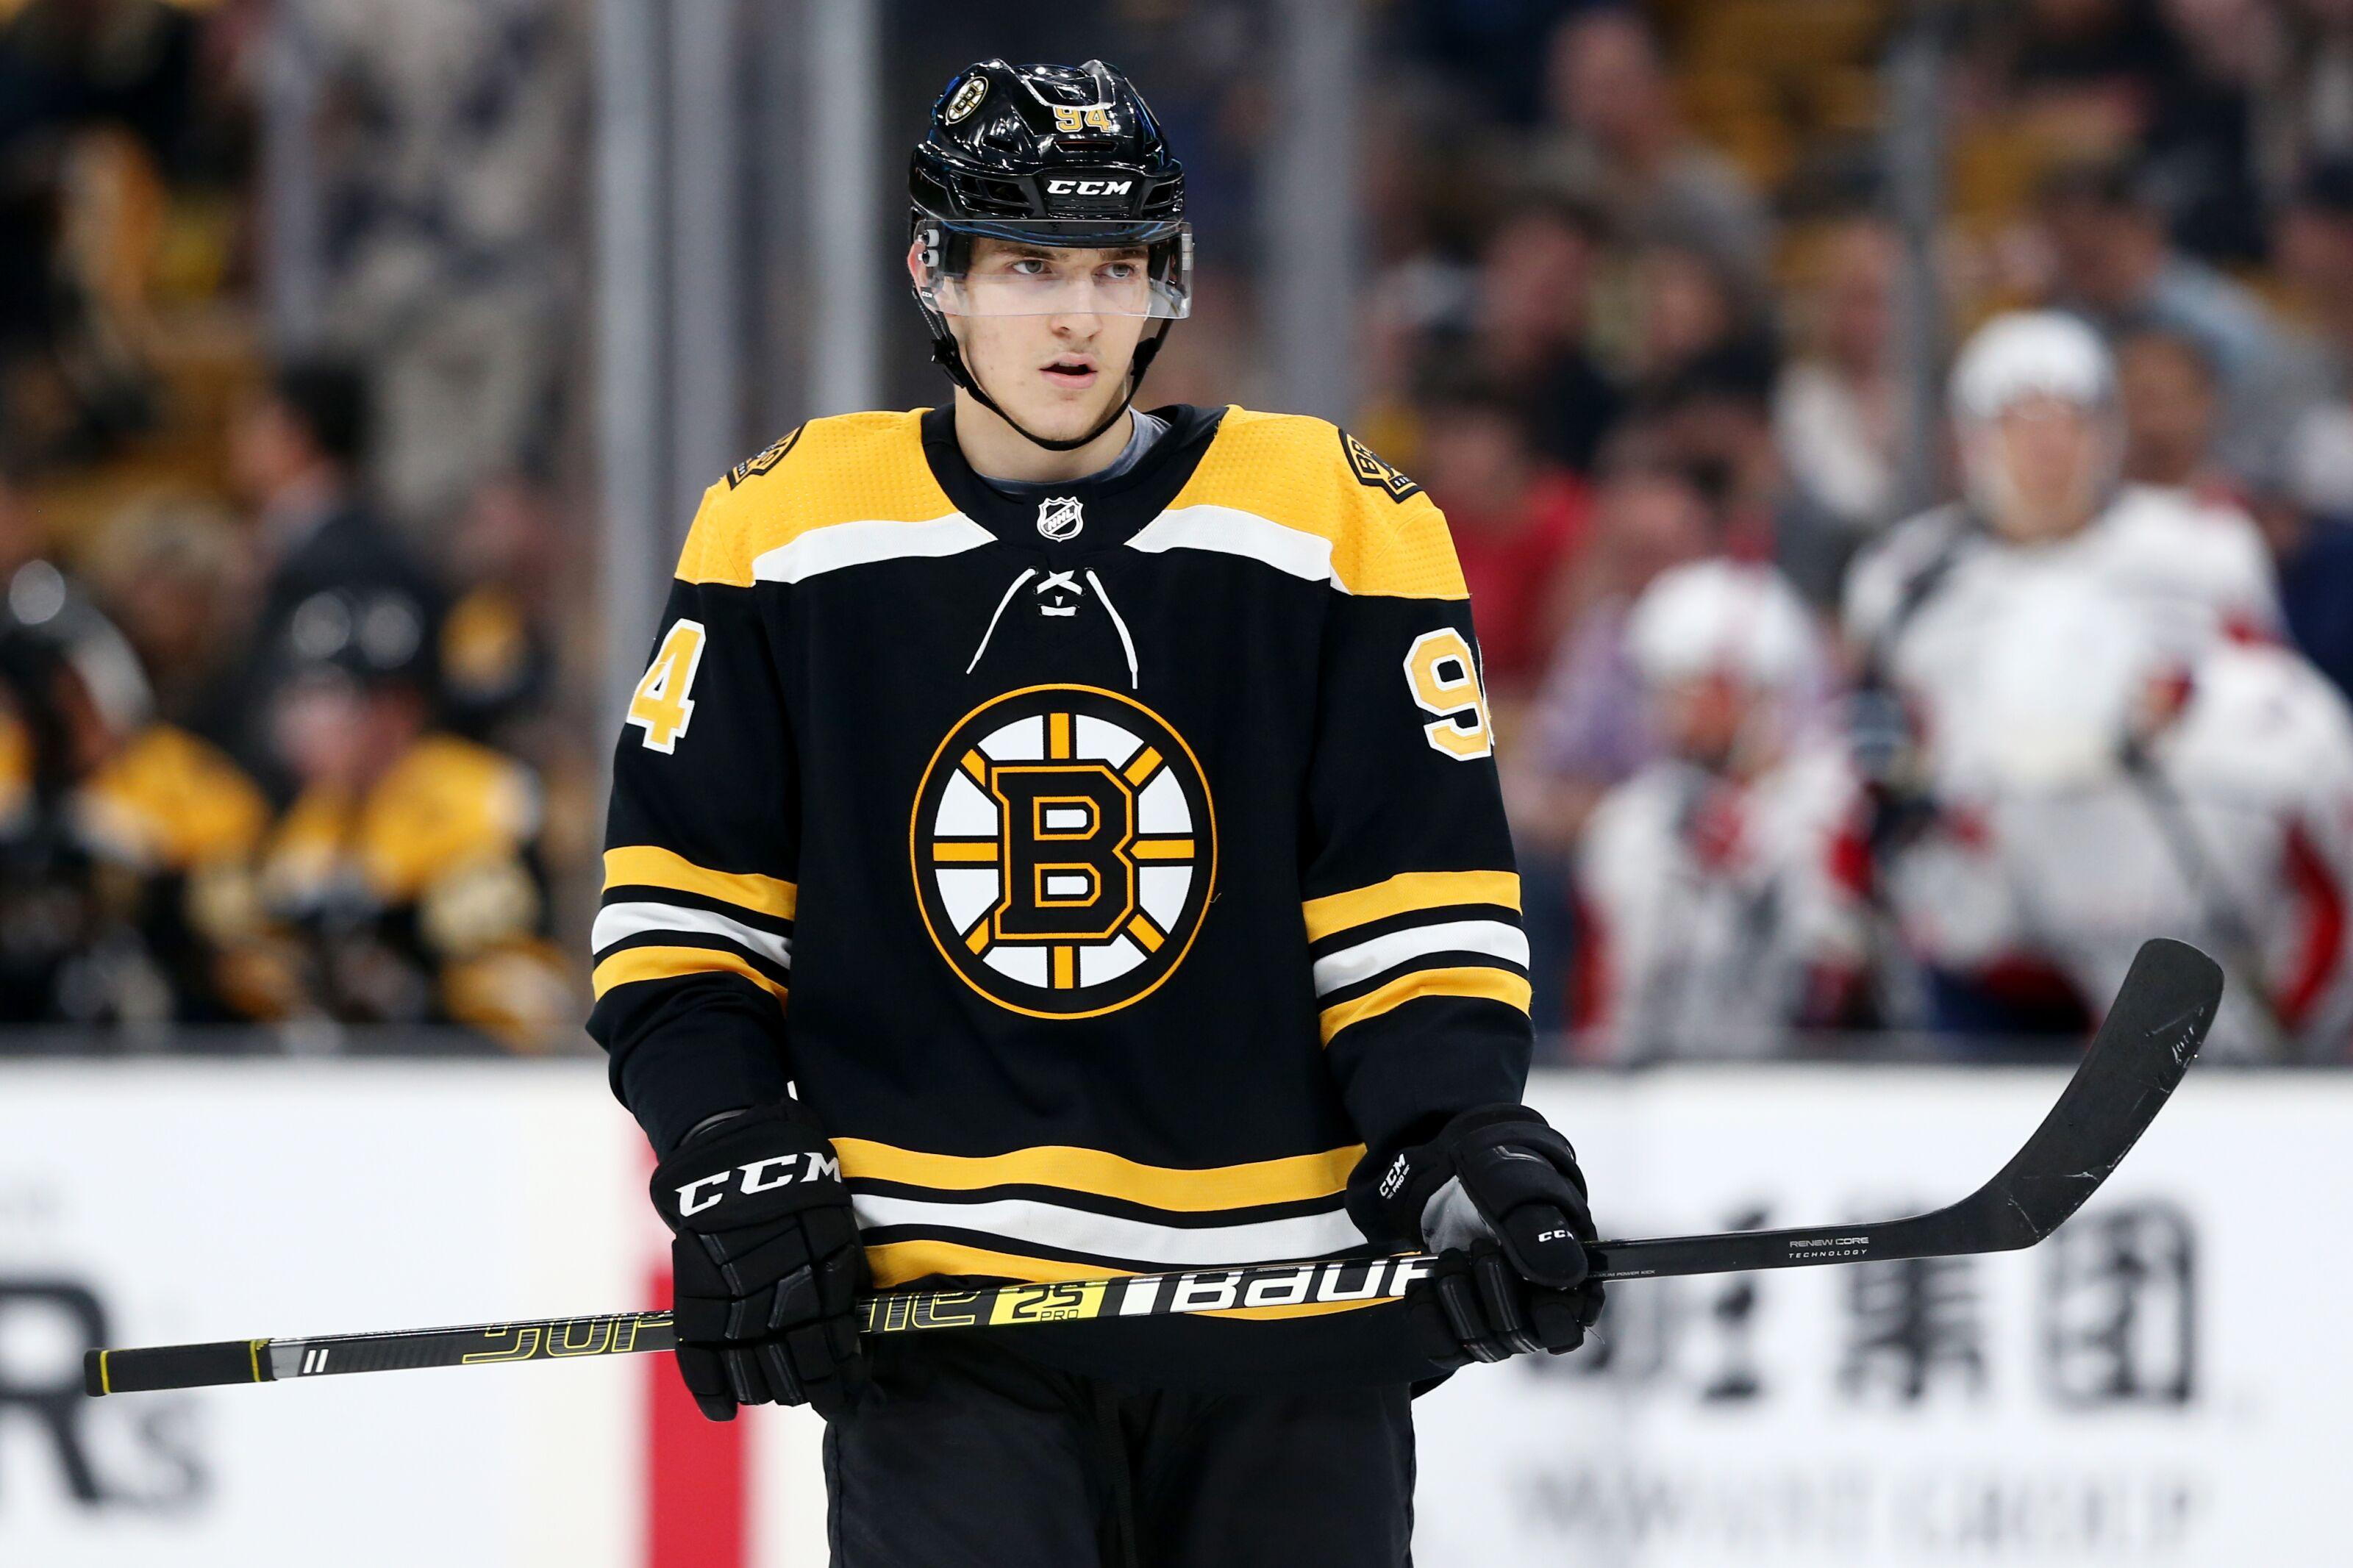 Boston Bruins: Jakub Lauko to the AHL or back to major junior?